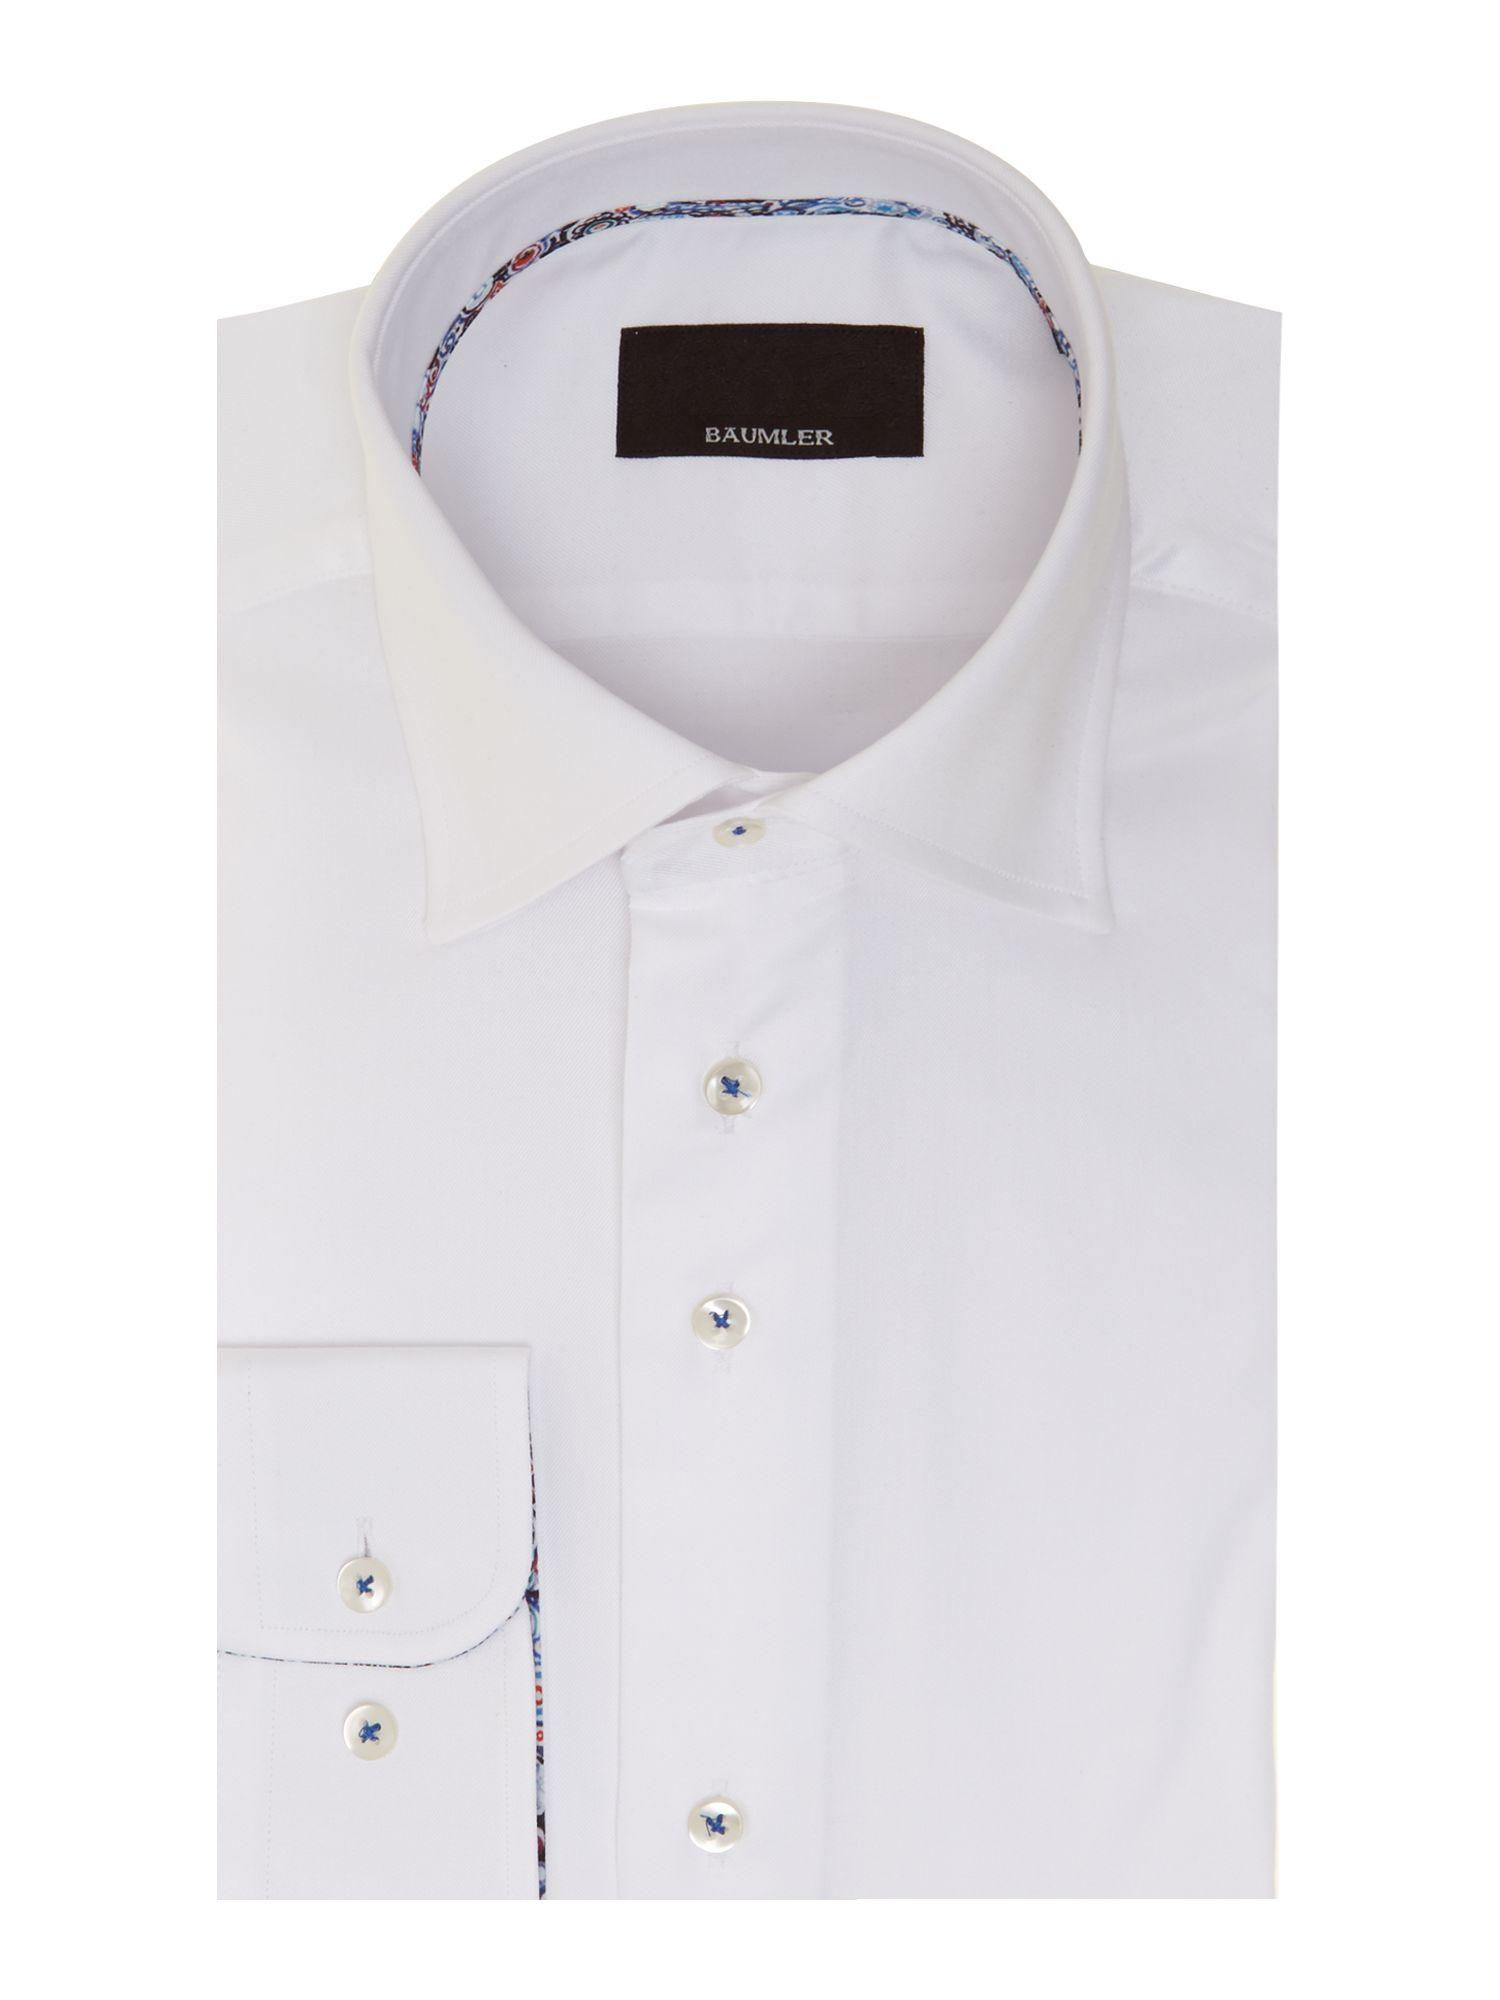 B umler single cuff shirt in white for men lyst for Single cuff dress shirt